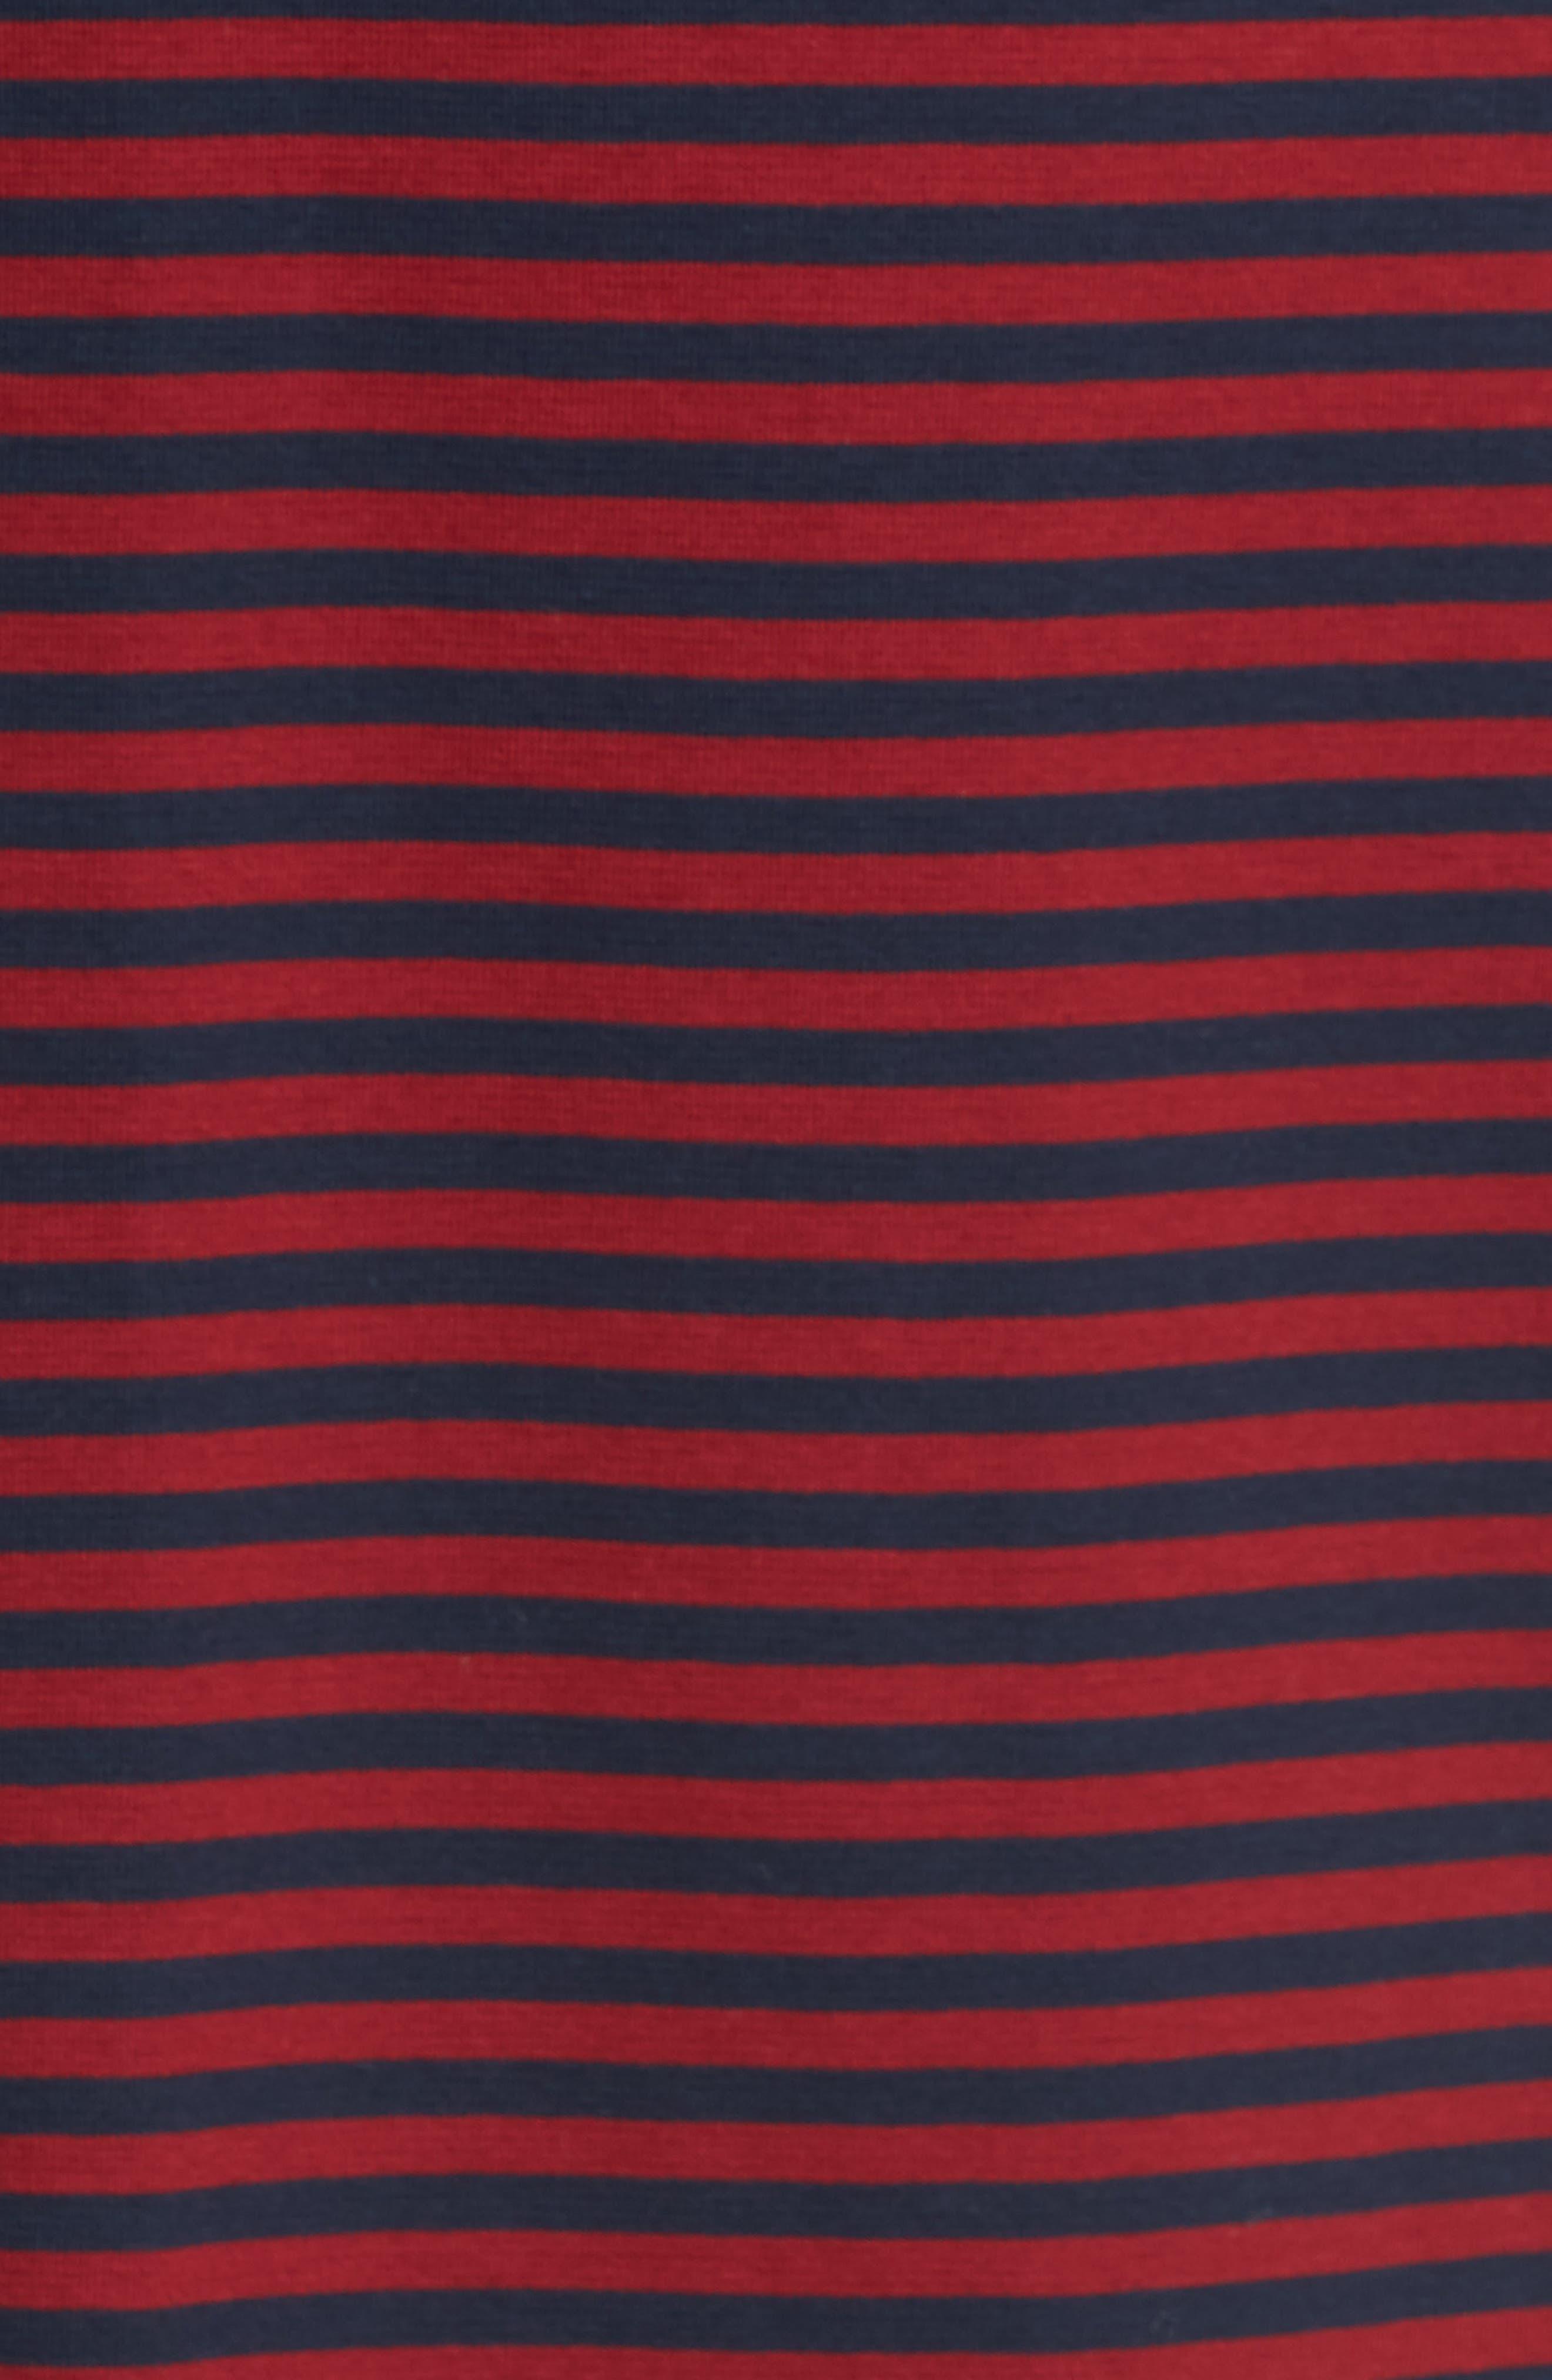 Stripe Long Sleeve T-Shirt,                             Alternate thumbnail 5, color,                             611